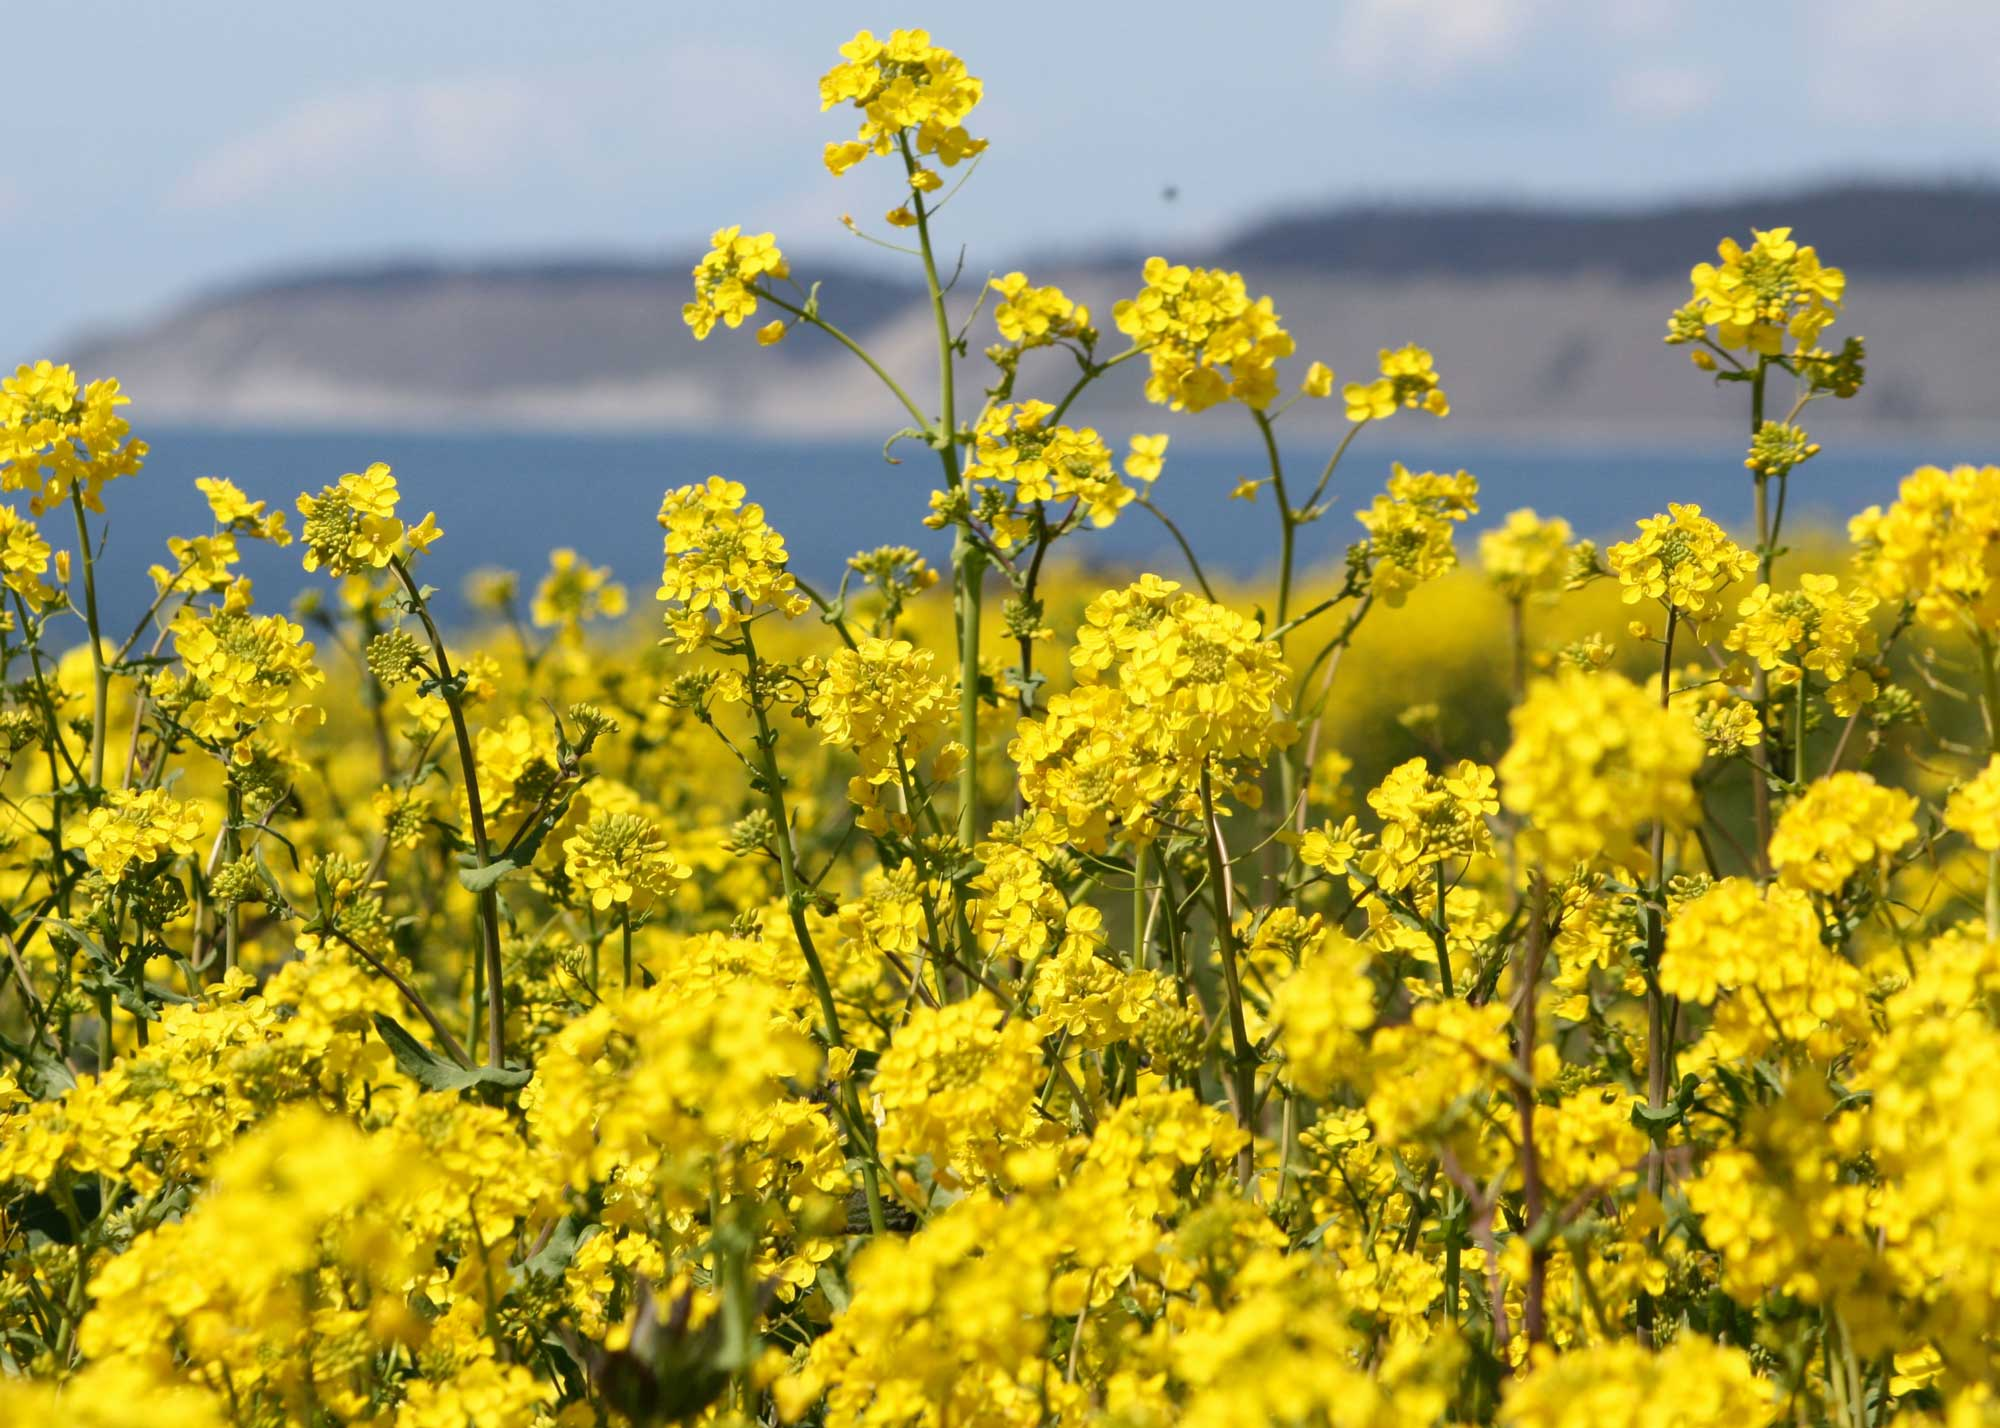 126_Yellow-Field-of-Mustard_rgb_opt_web.jpg